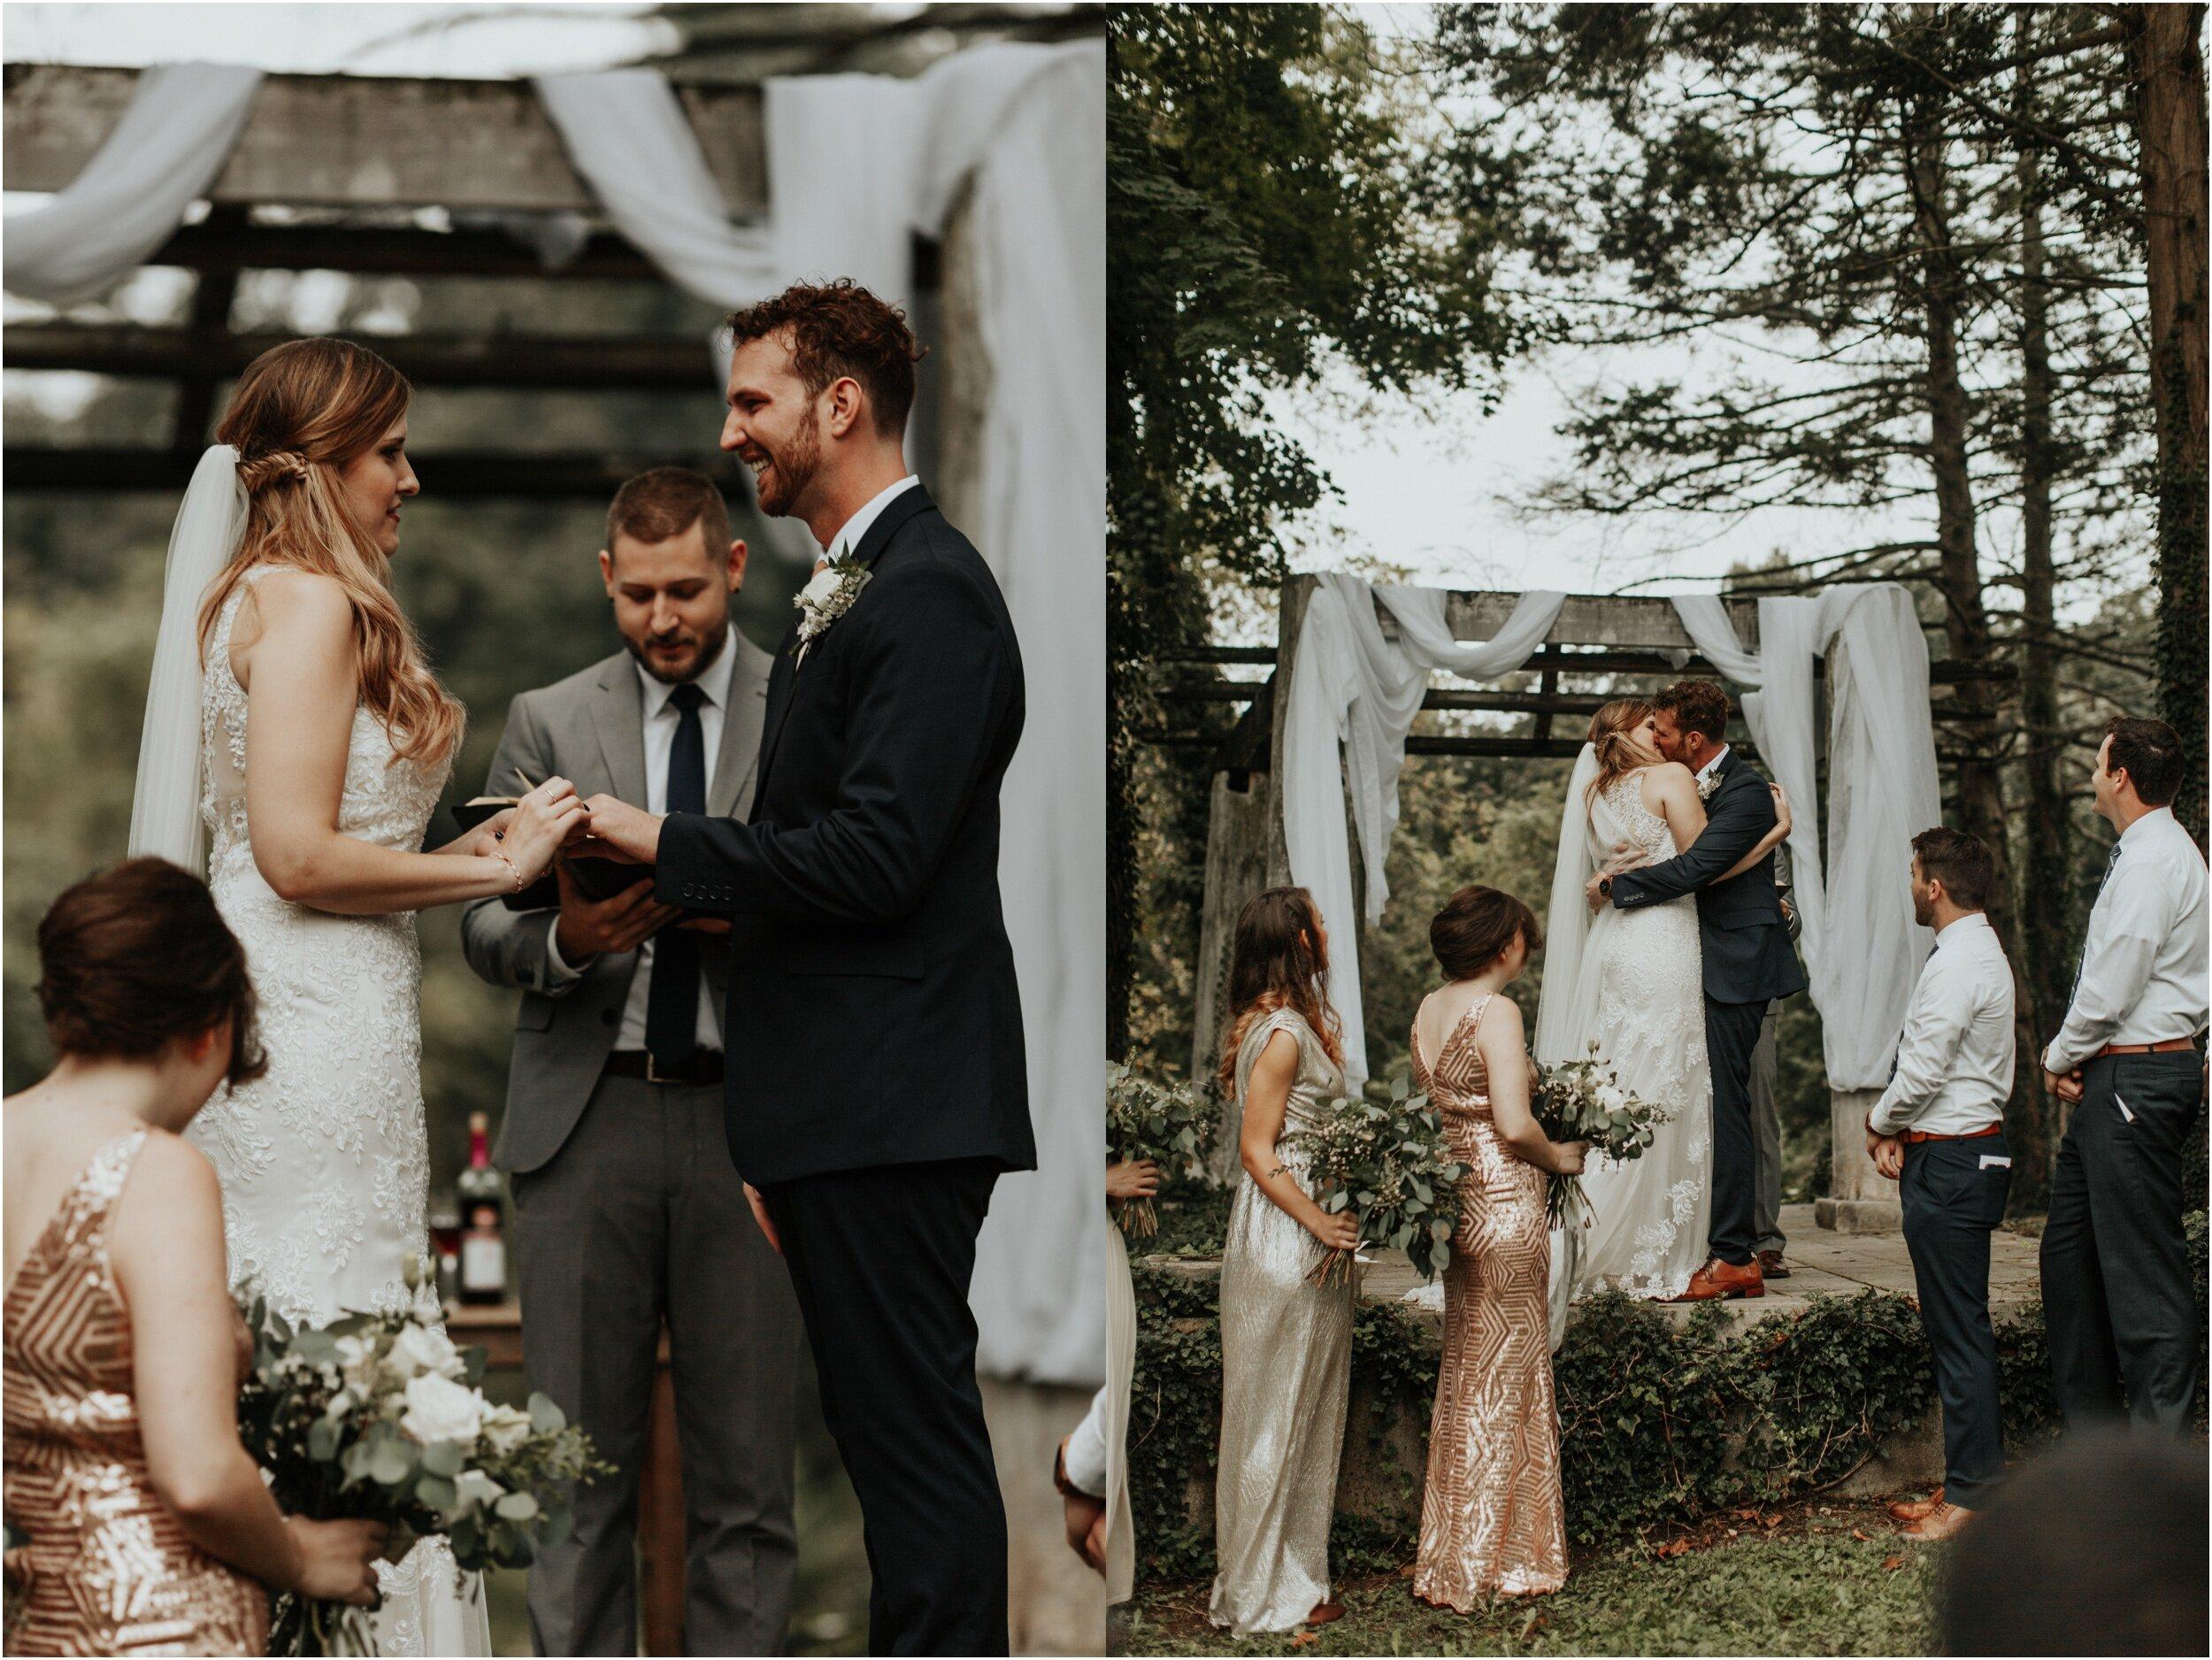 steph-and-jordan-cox-our-wedding-historic-shady-lane-compass-wedding-collective-hazel-lining-photography-destination-elopement-wedding-engagement-photography_0066.jpg